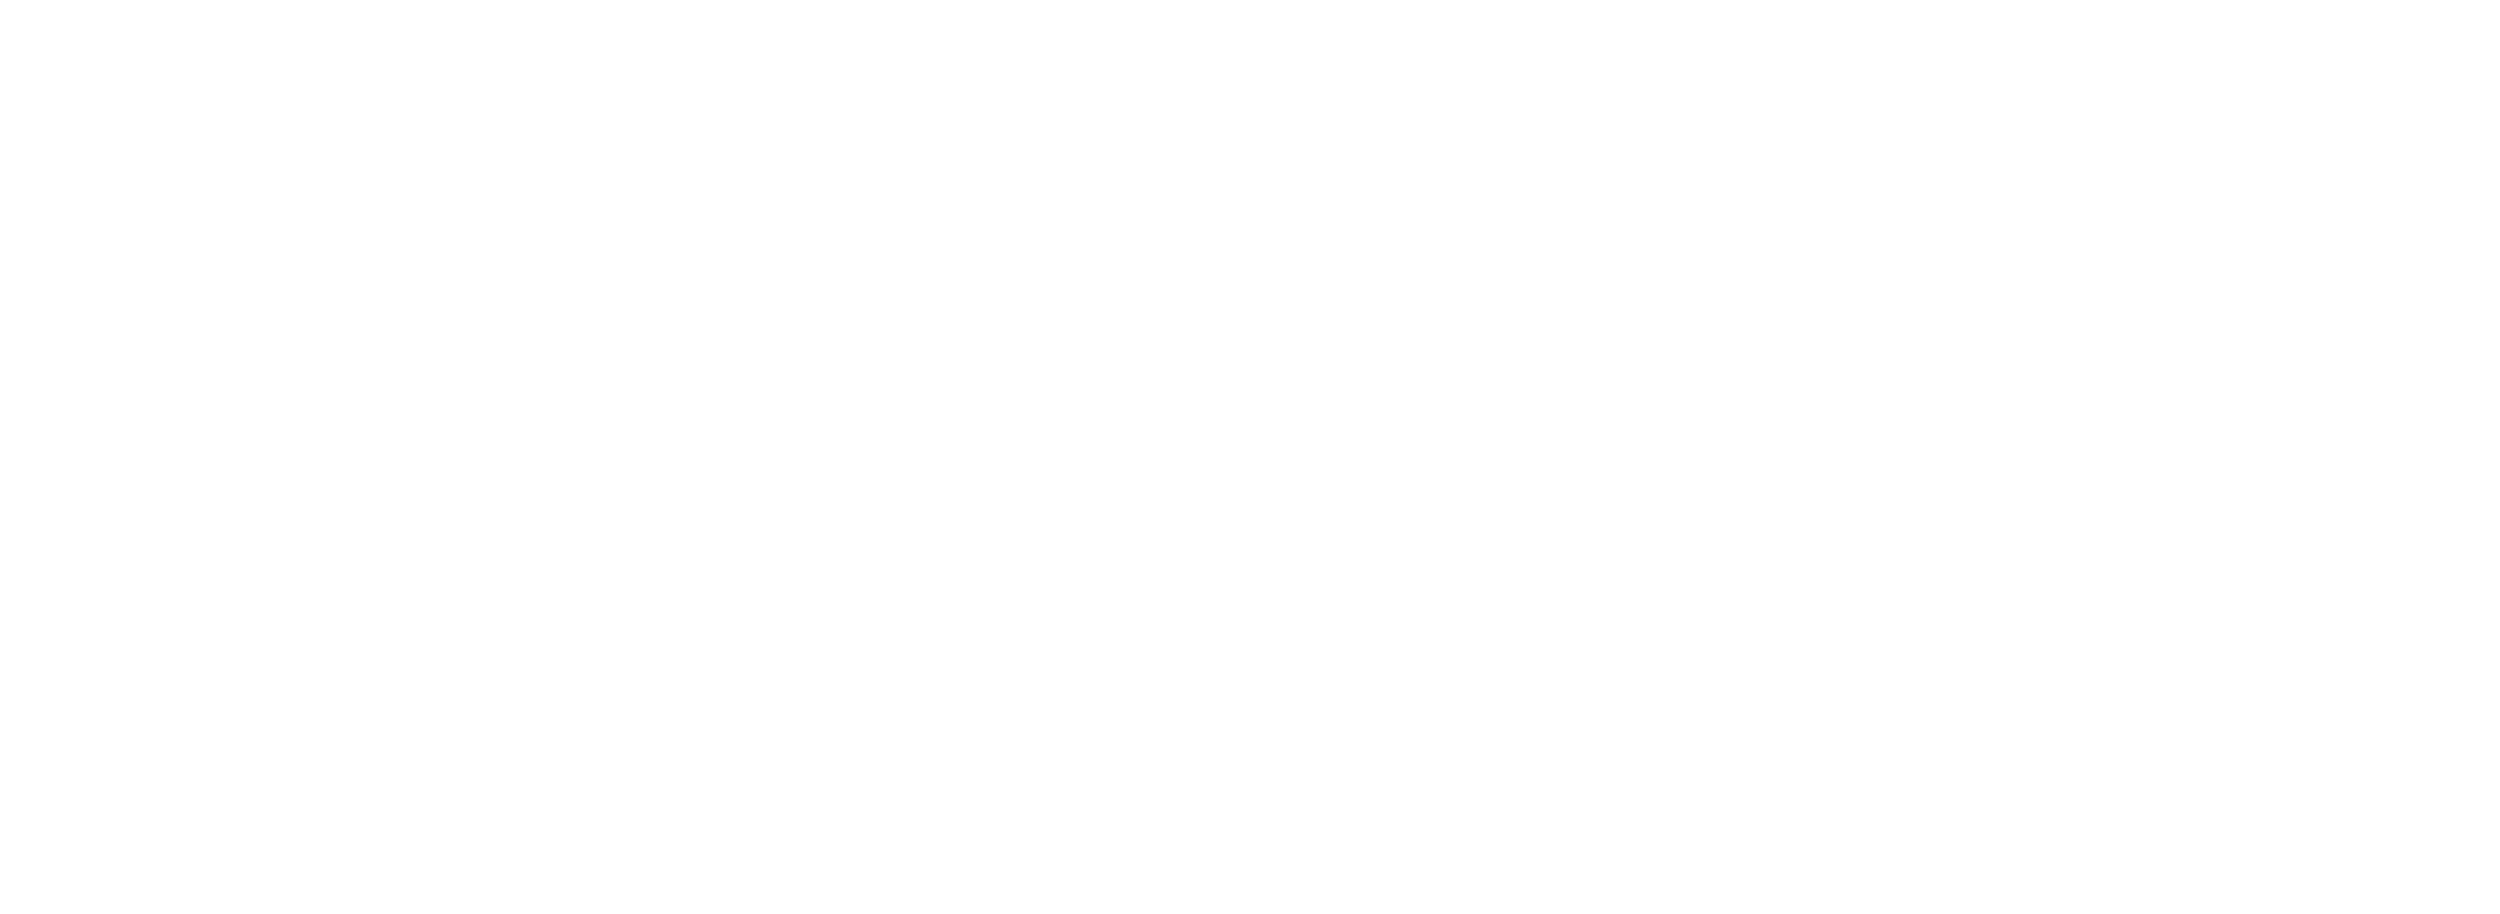 ATLFS-WHITE-REV-Horizontal-600DPI.png